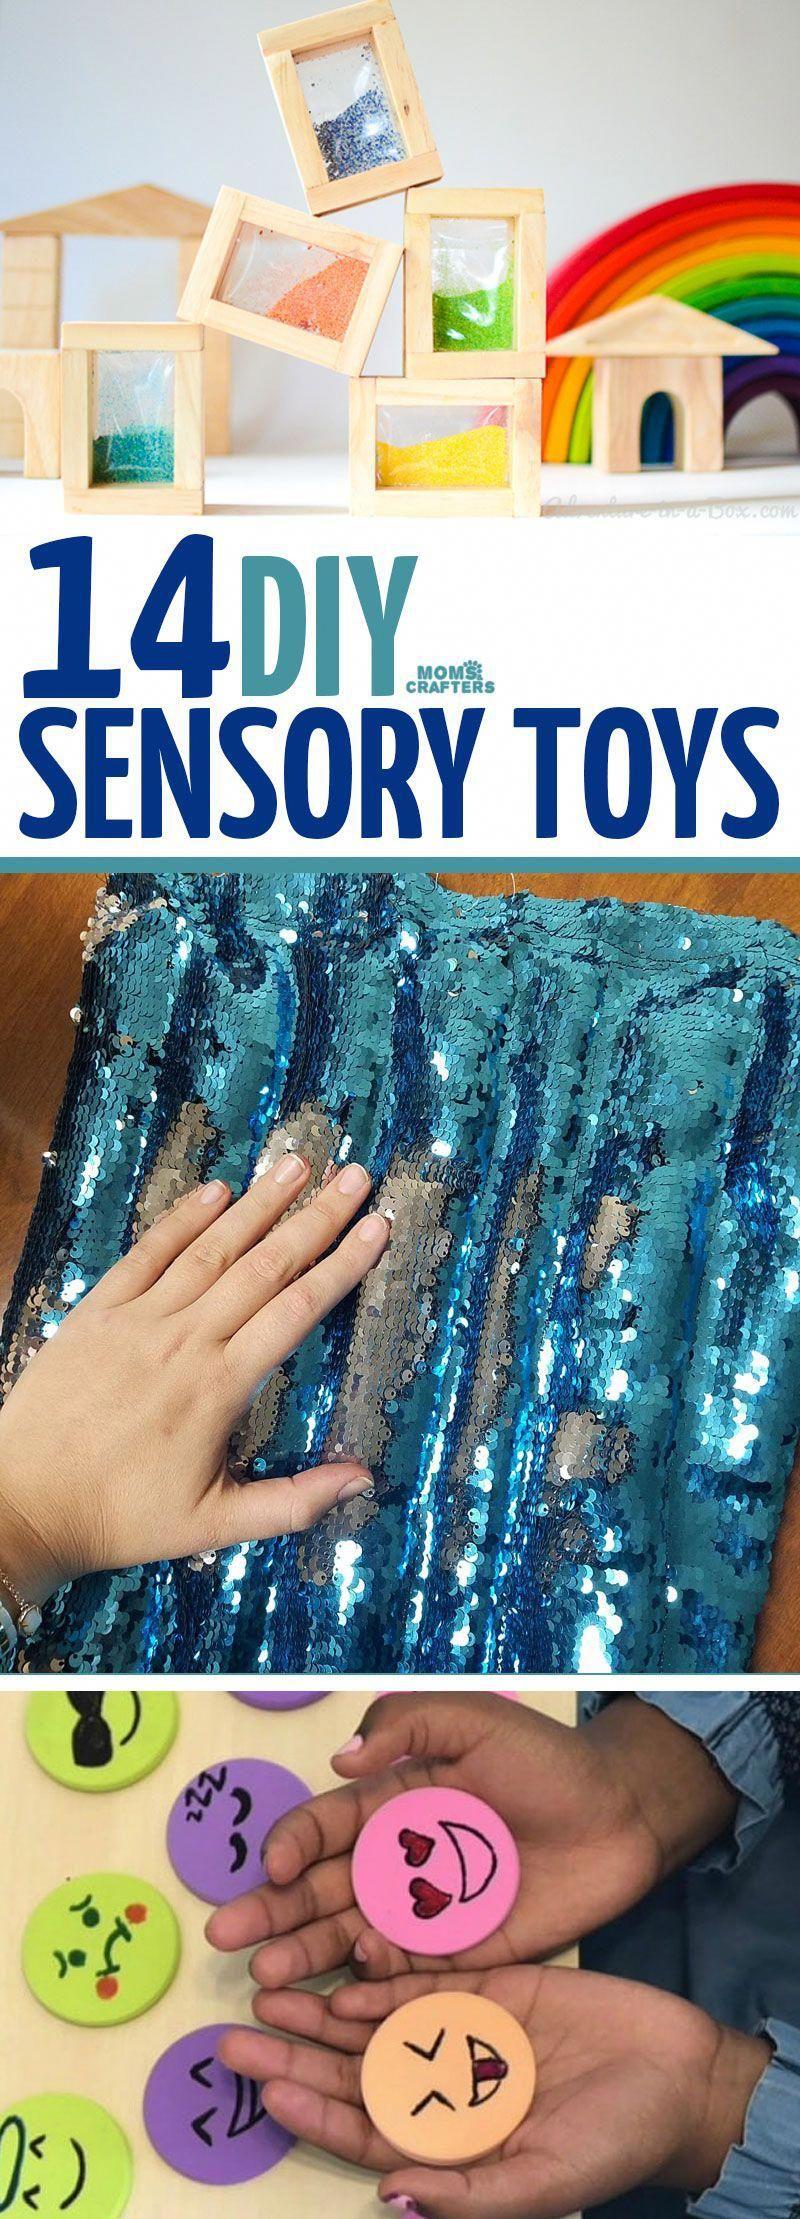 diy sensory toys for babies